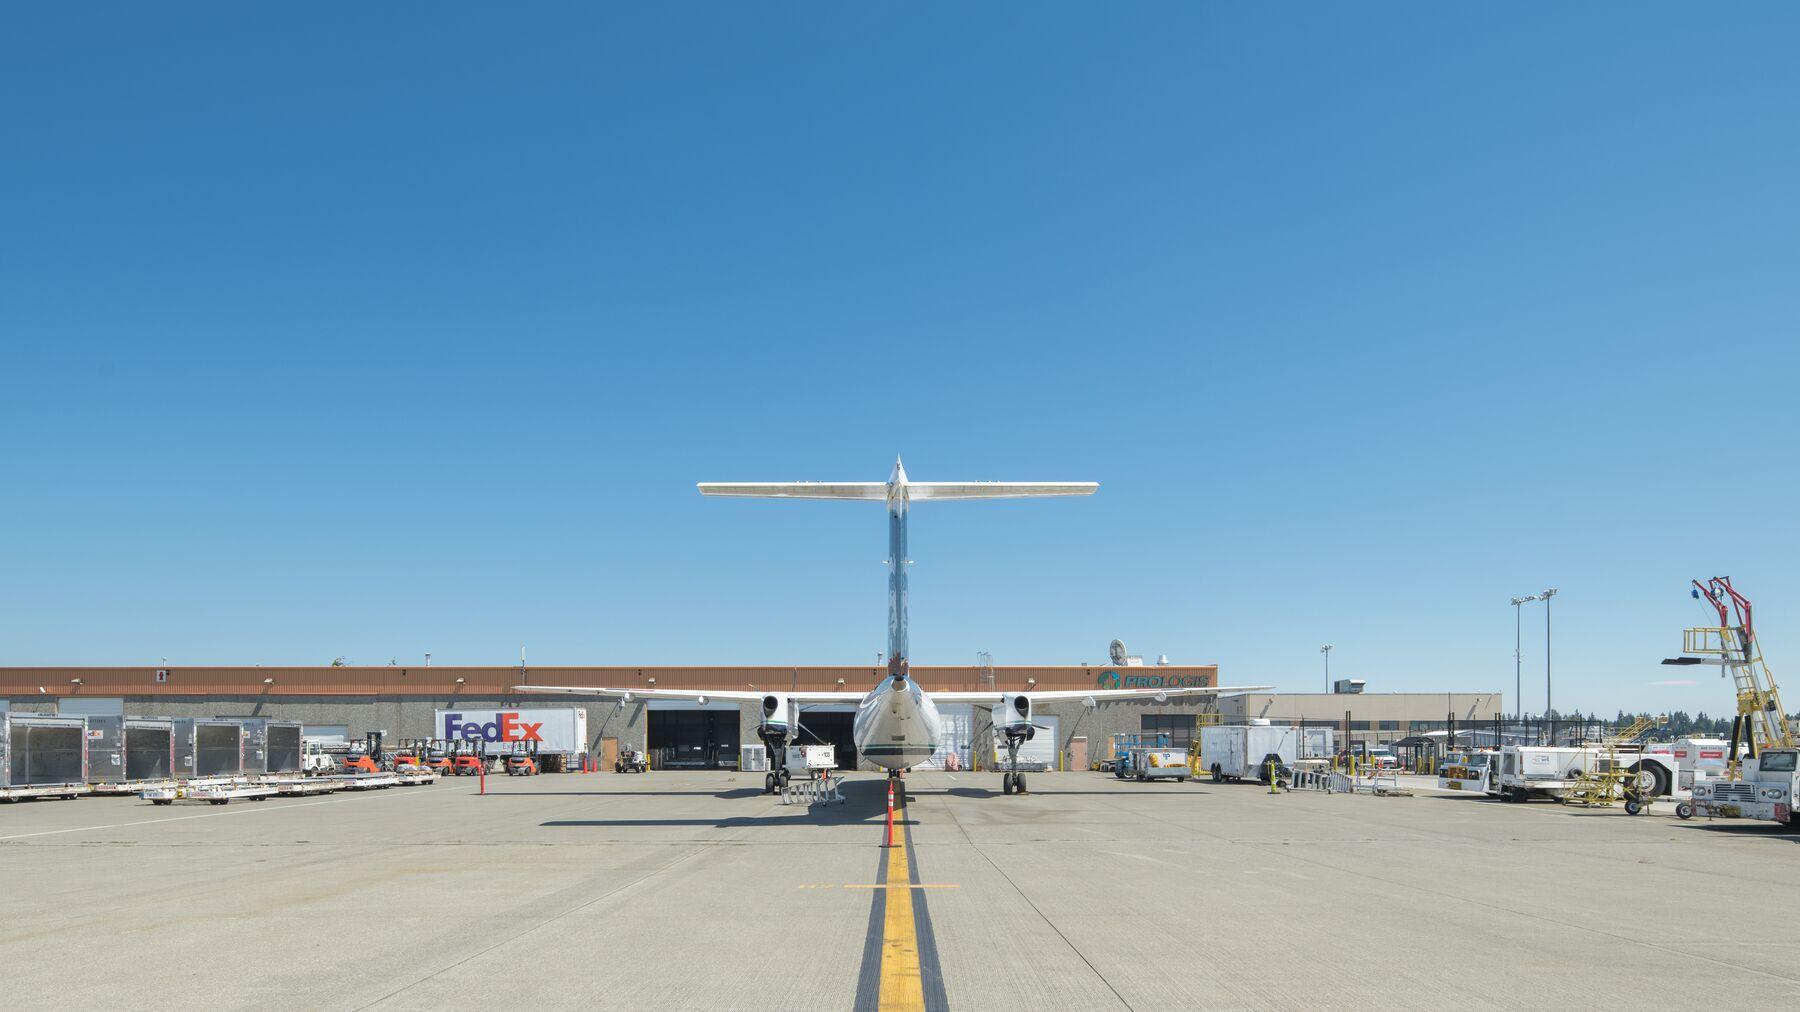 DPM-SEA-Cargo-Center-North-922-7.jpg